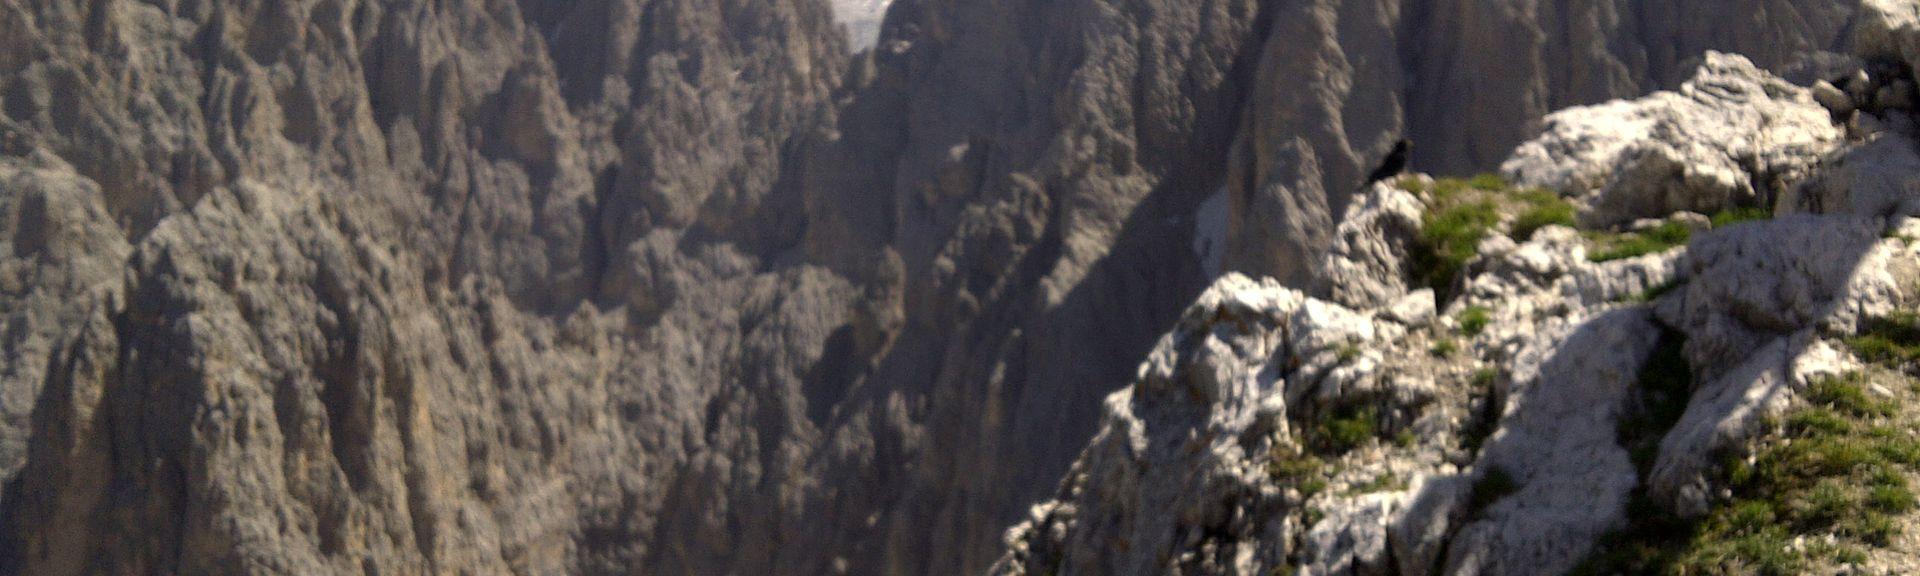 Seis am Schlern, Alto Adige, Trentino-Alto Adige/South Tyrol, Italy